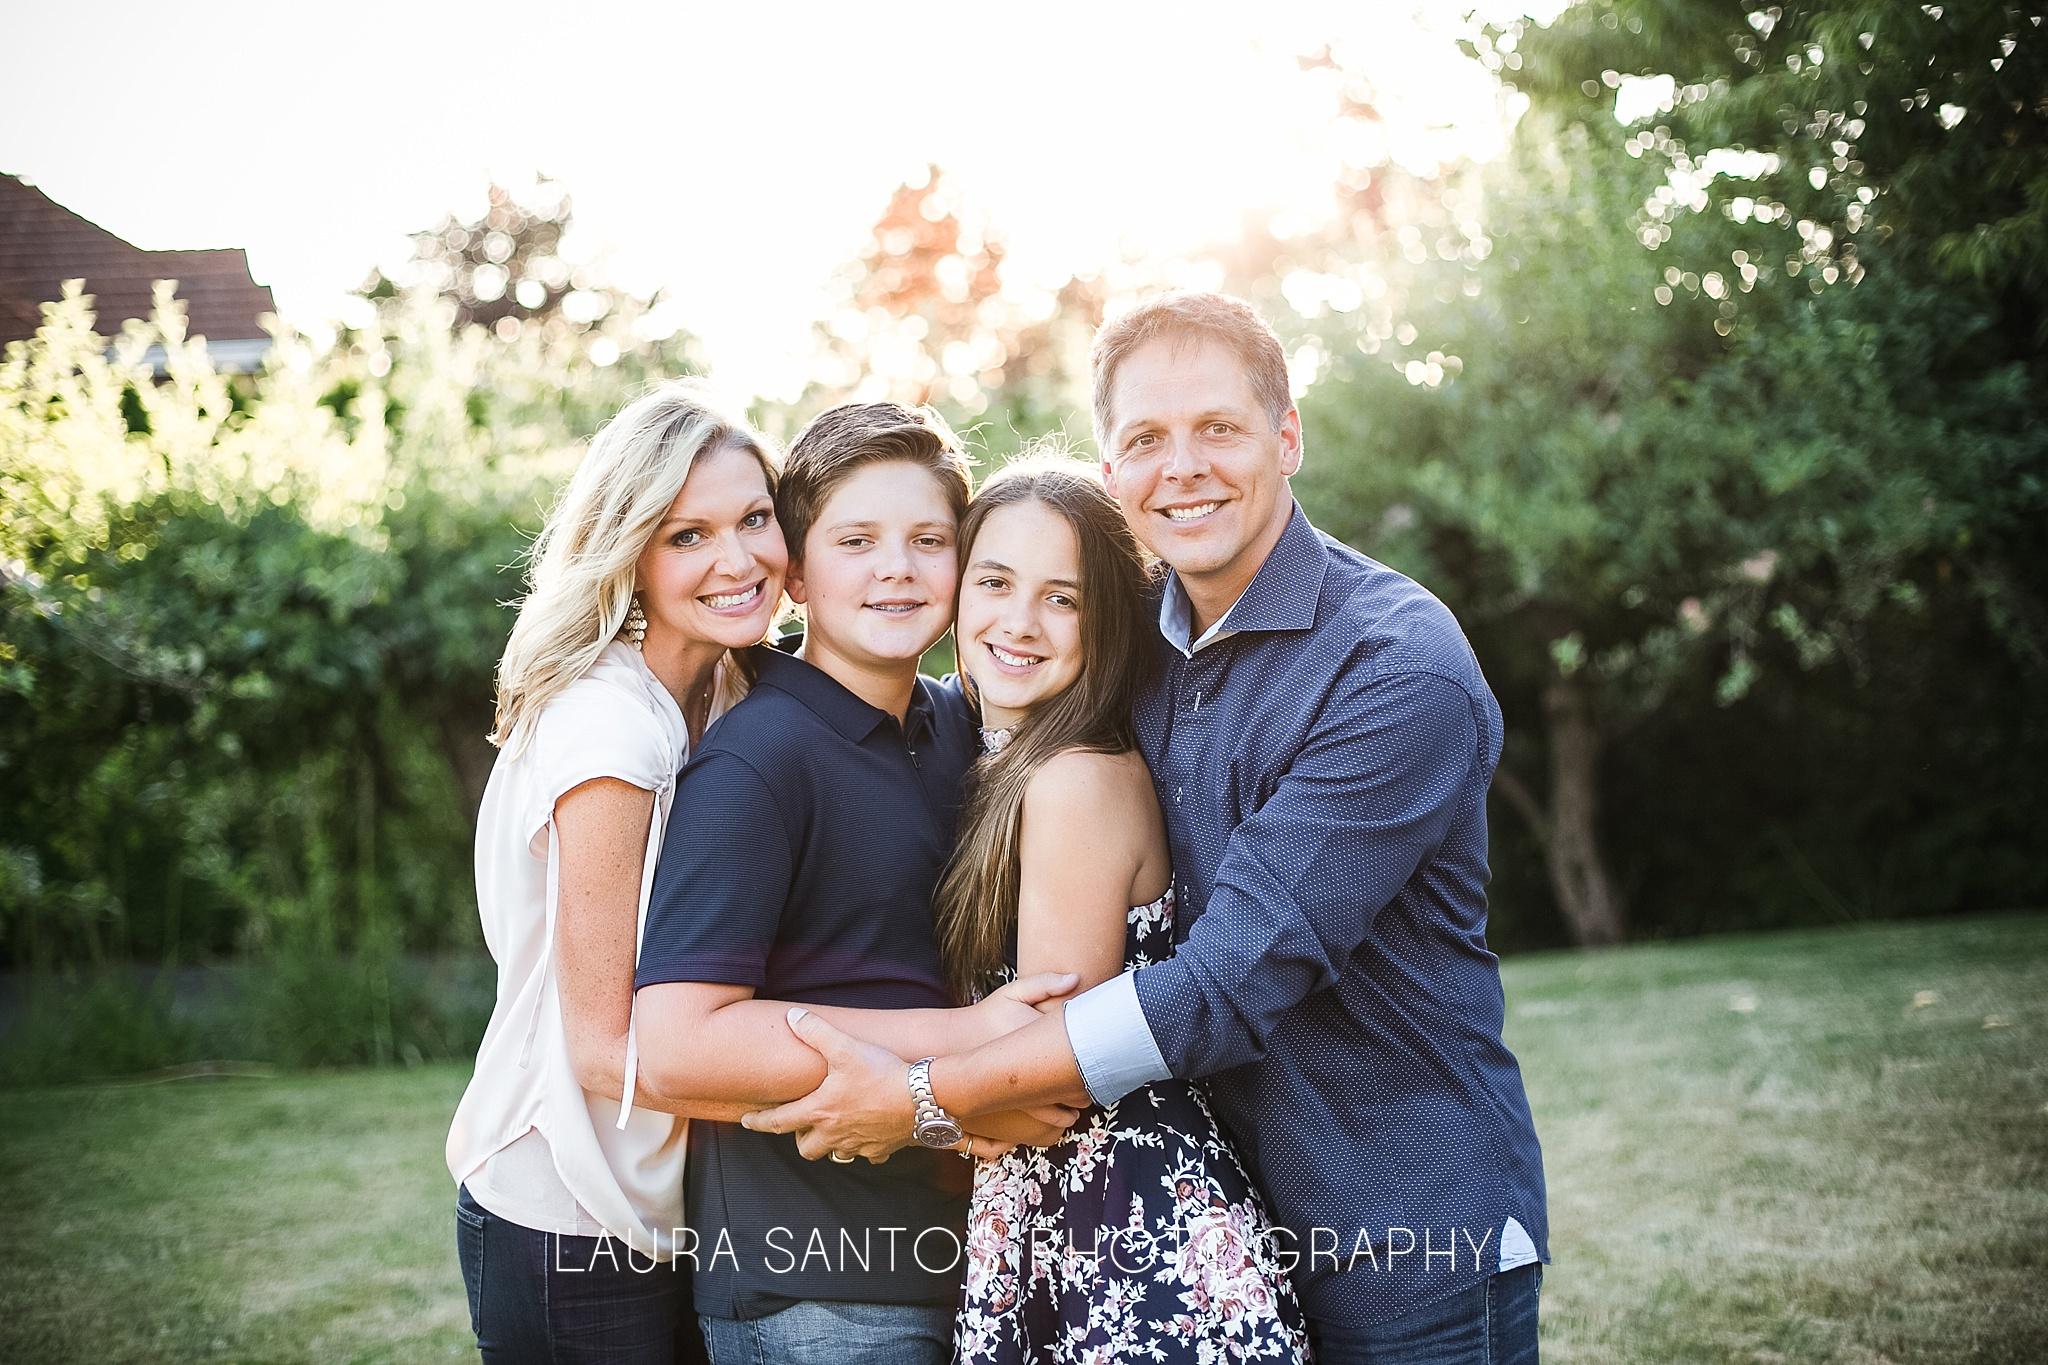 Laura Santos Photography Portland Oregon Family Photographer_0120.jpg